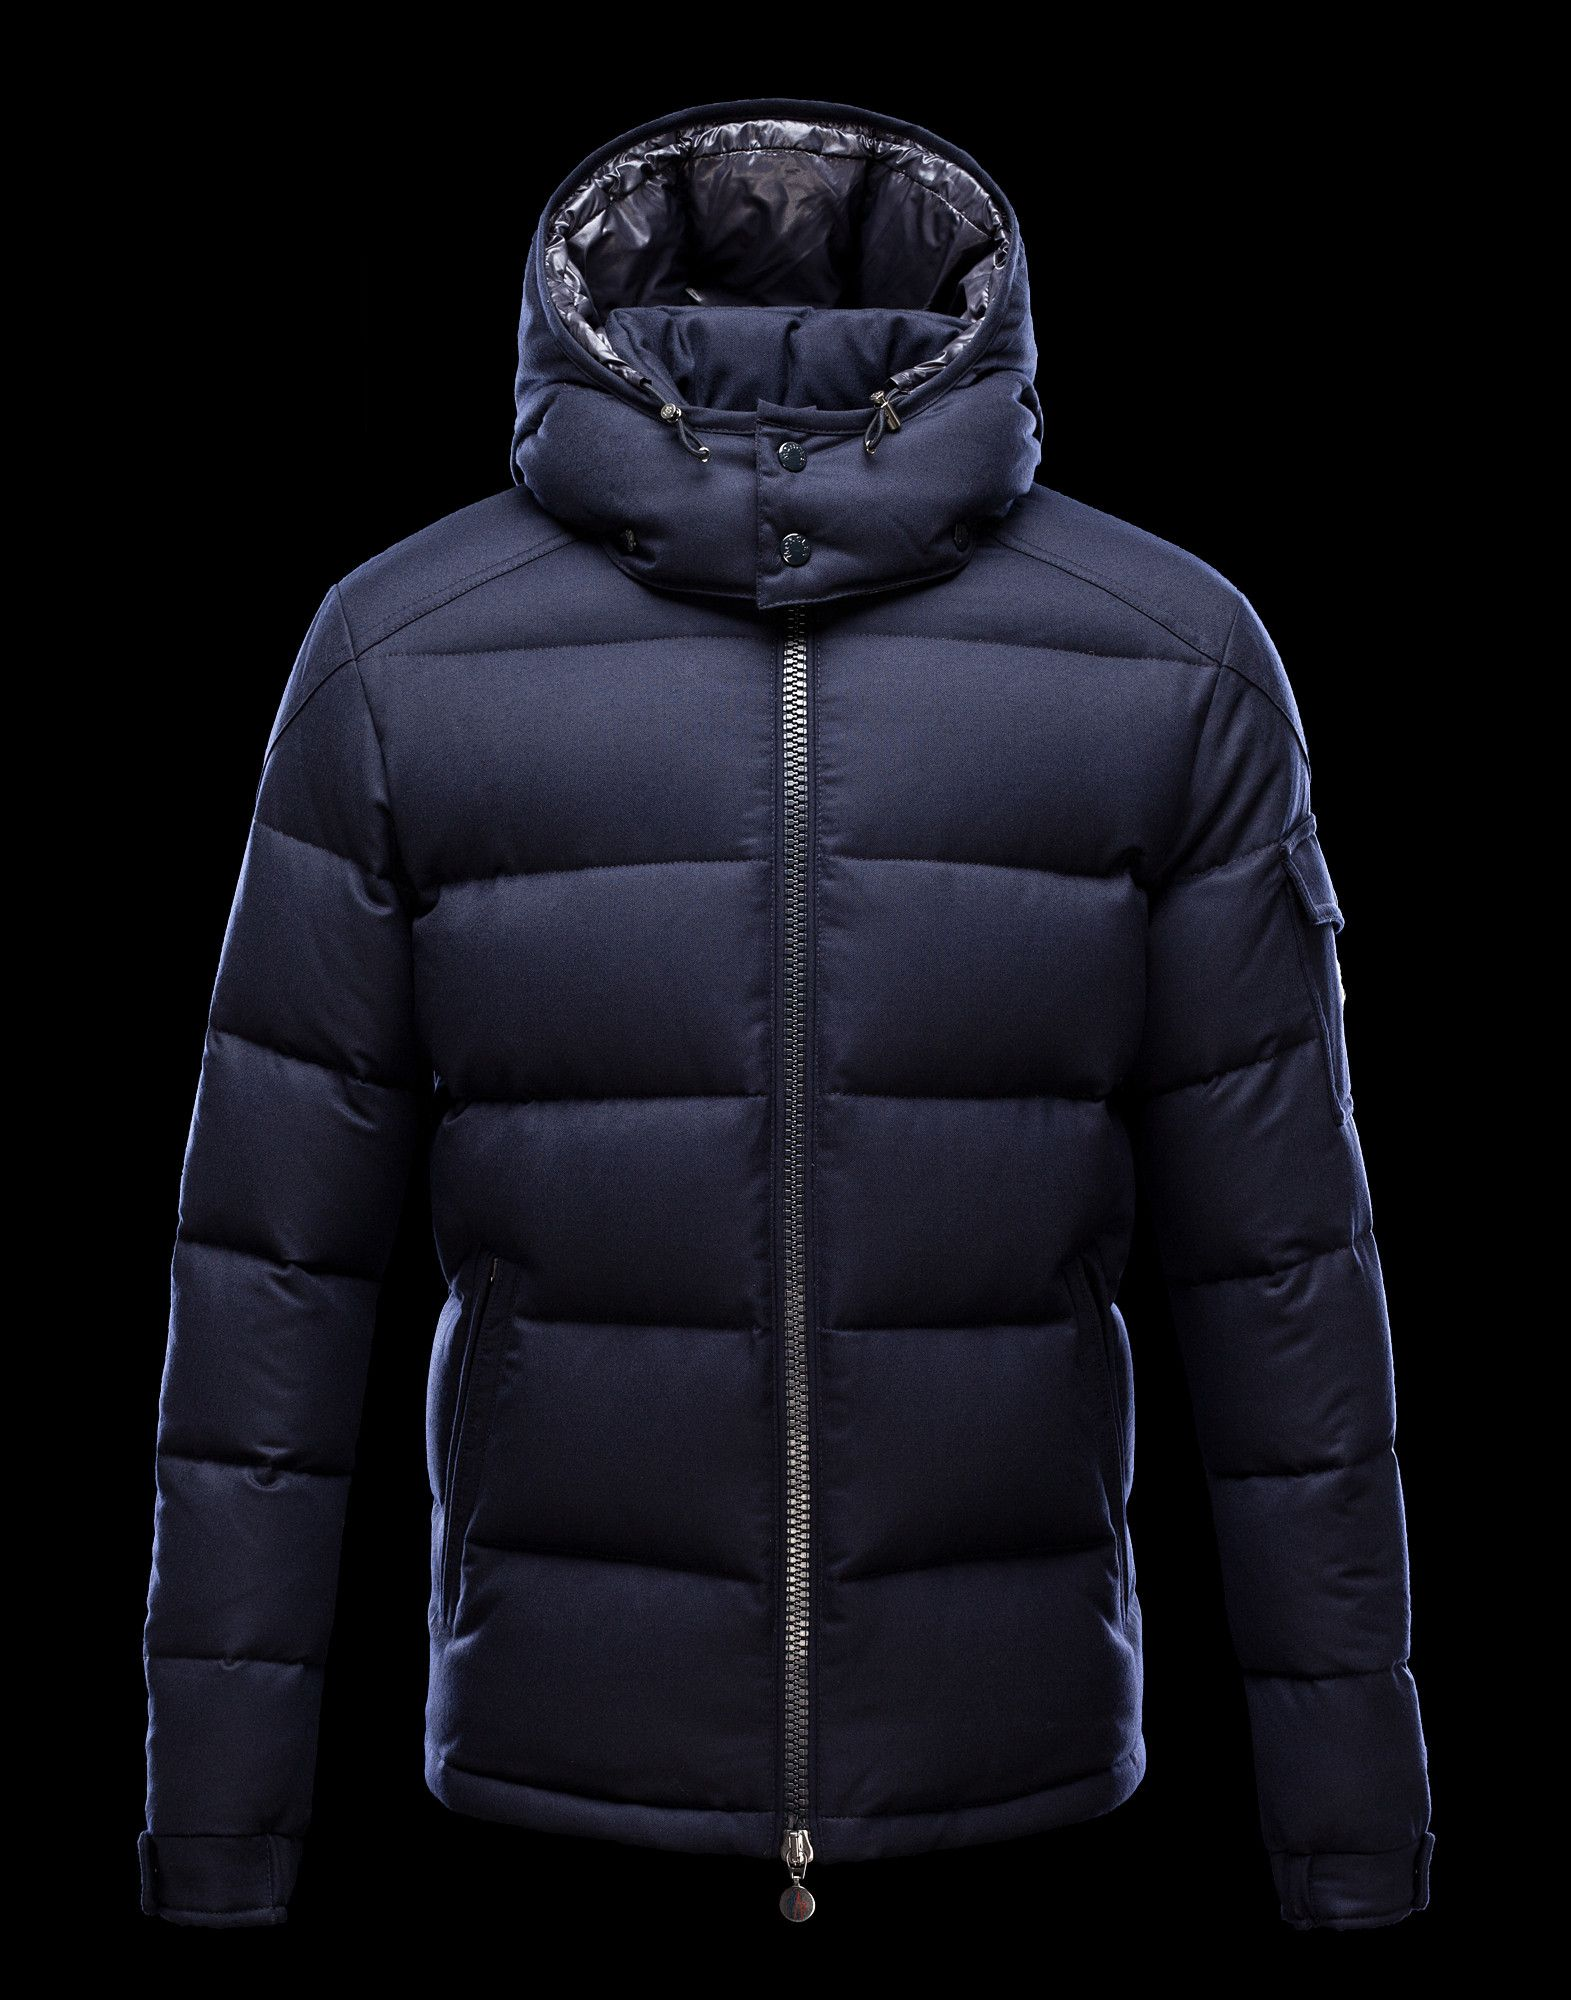 22db0c4b0 MONCLER Men - Fall Winter 12 - OUTERWEAR - Jacket - Montgenevre www ...